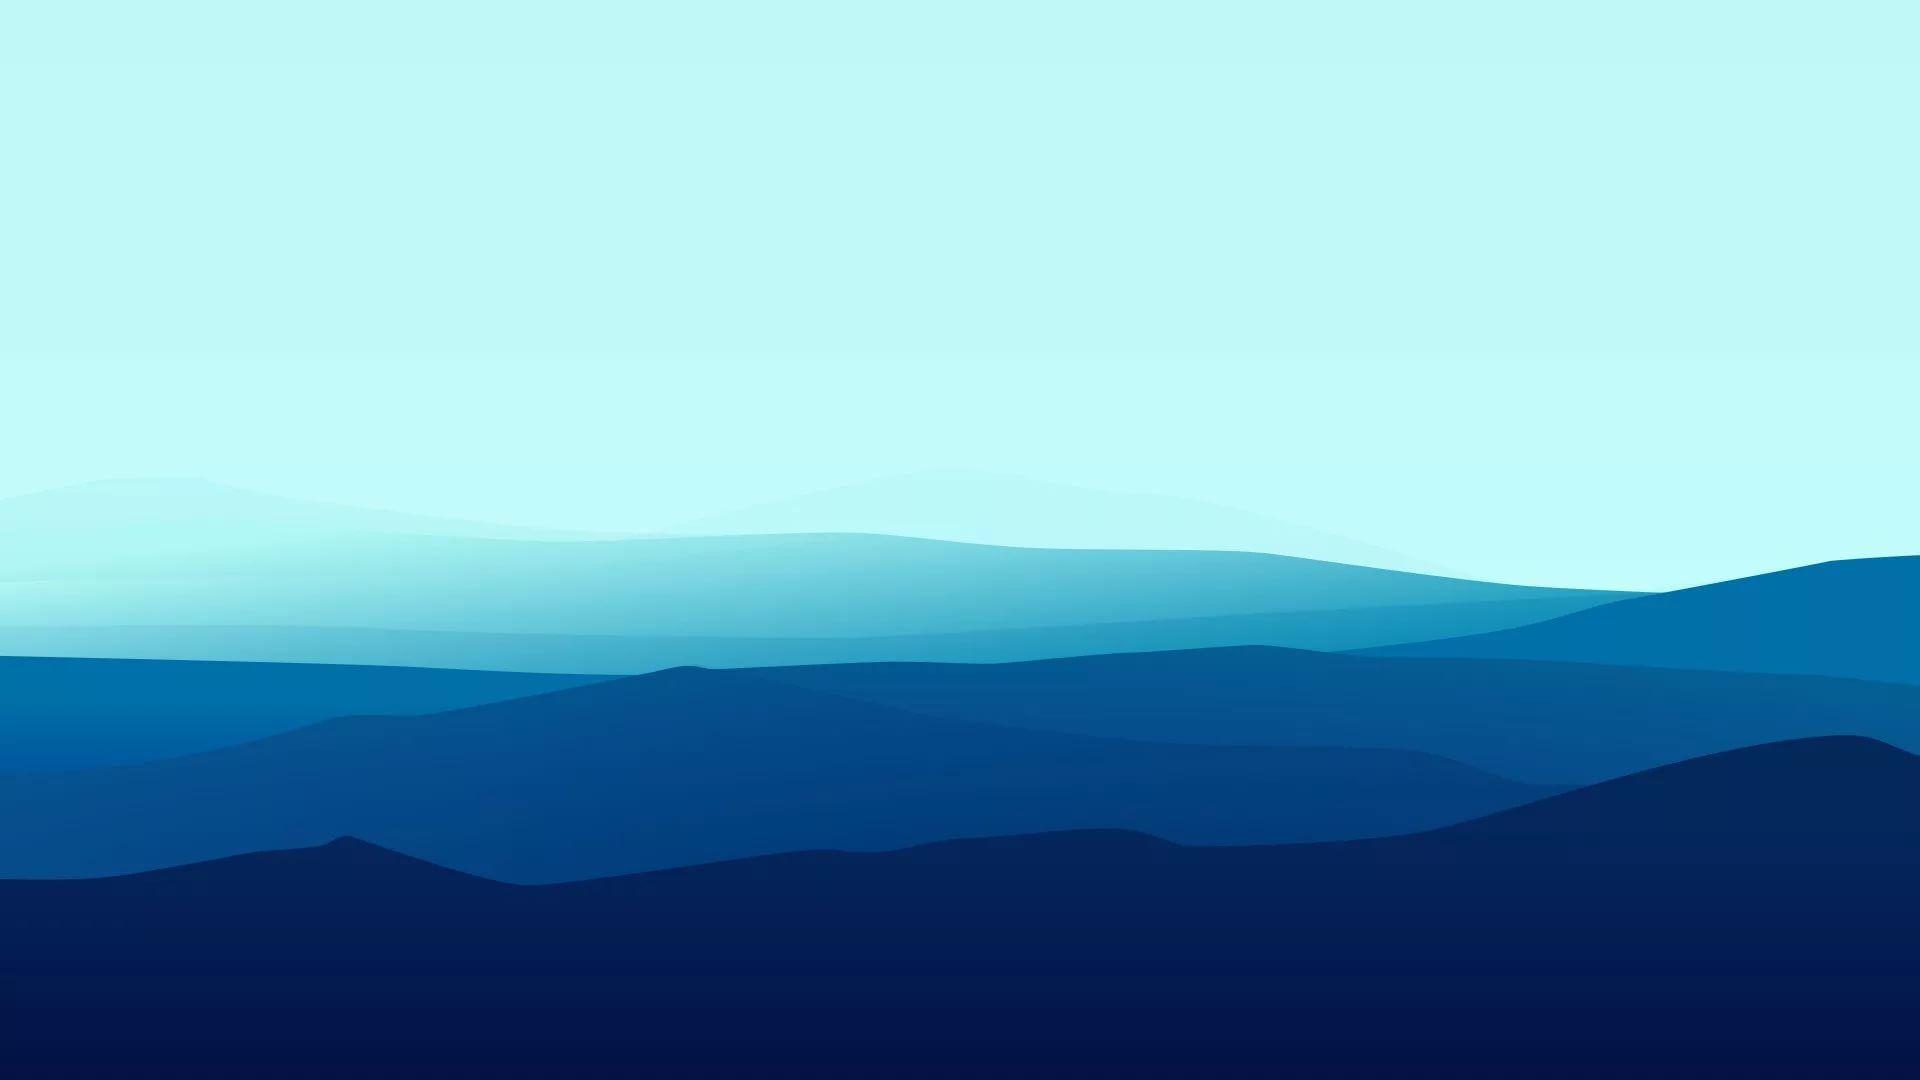 minimalist desktop 1